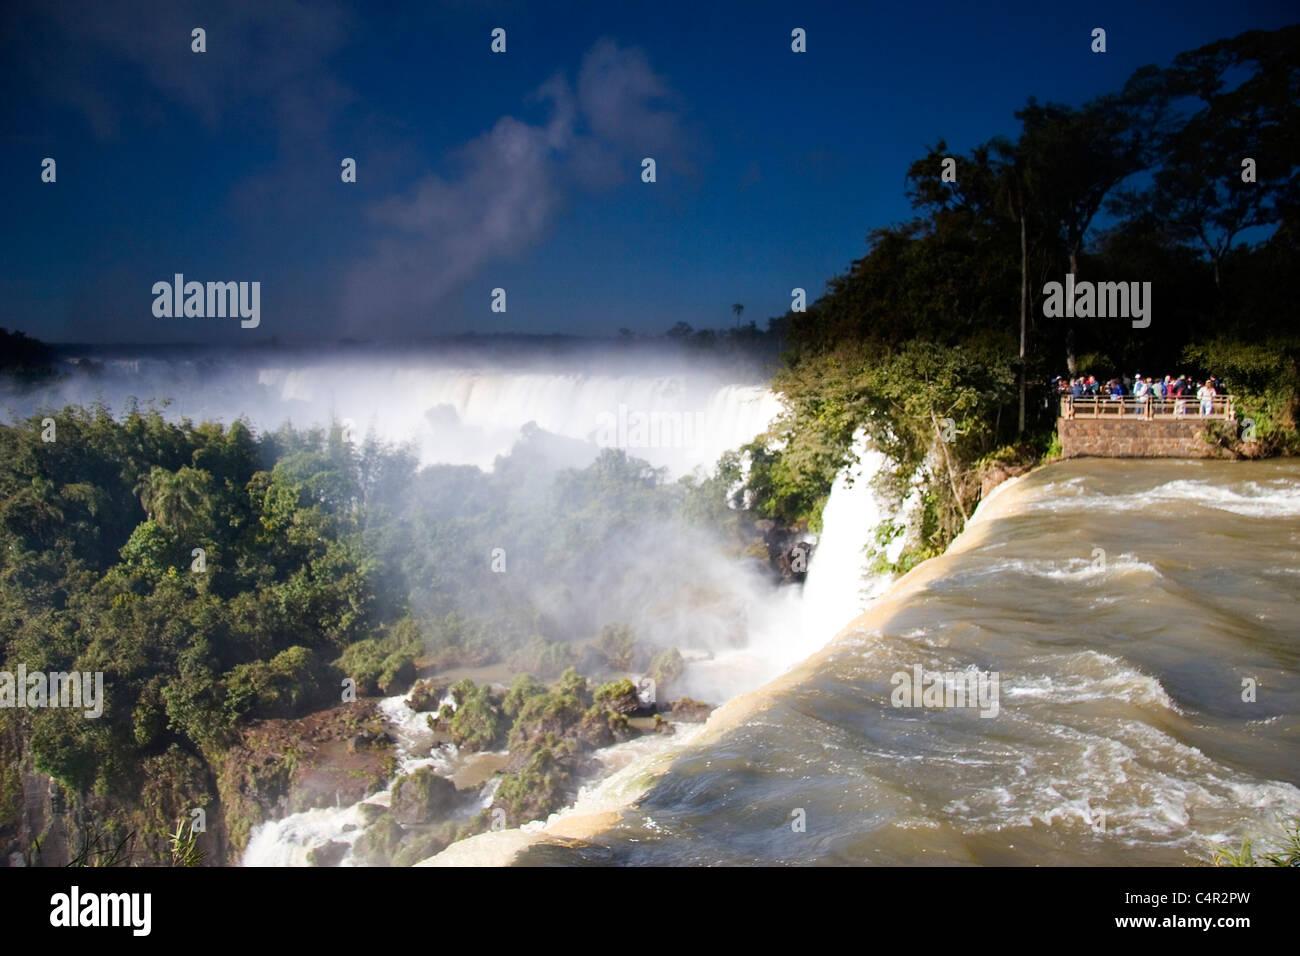 Le cascate mozzafiato di Puerto Iguazu (Argentina) e di Foz do Iguacu (Brasile) Immagini Stock